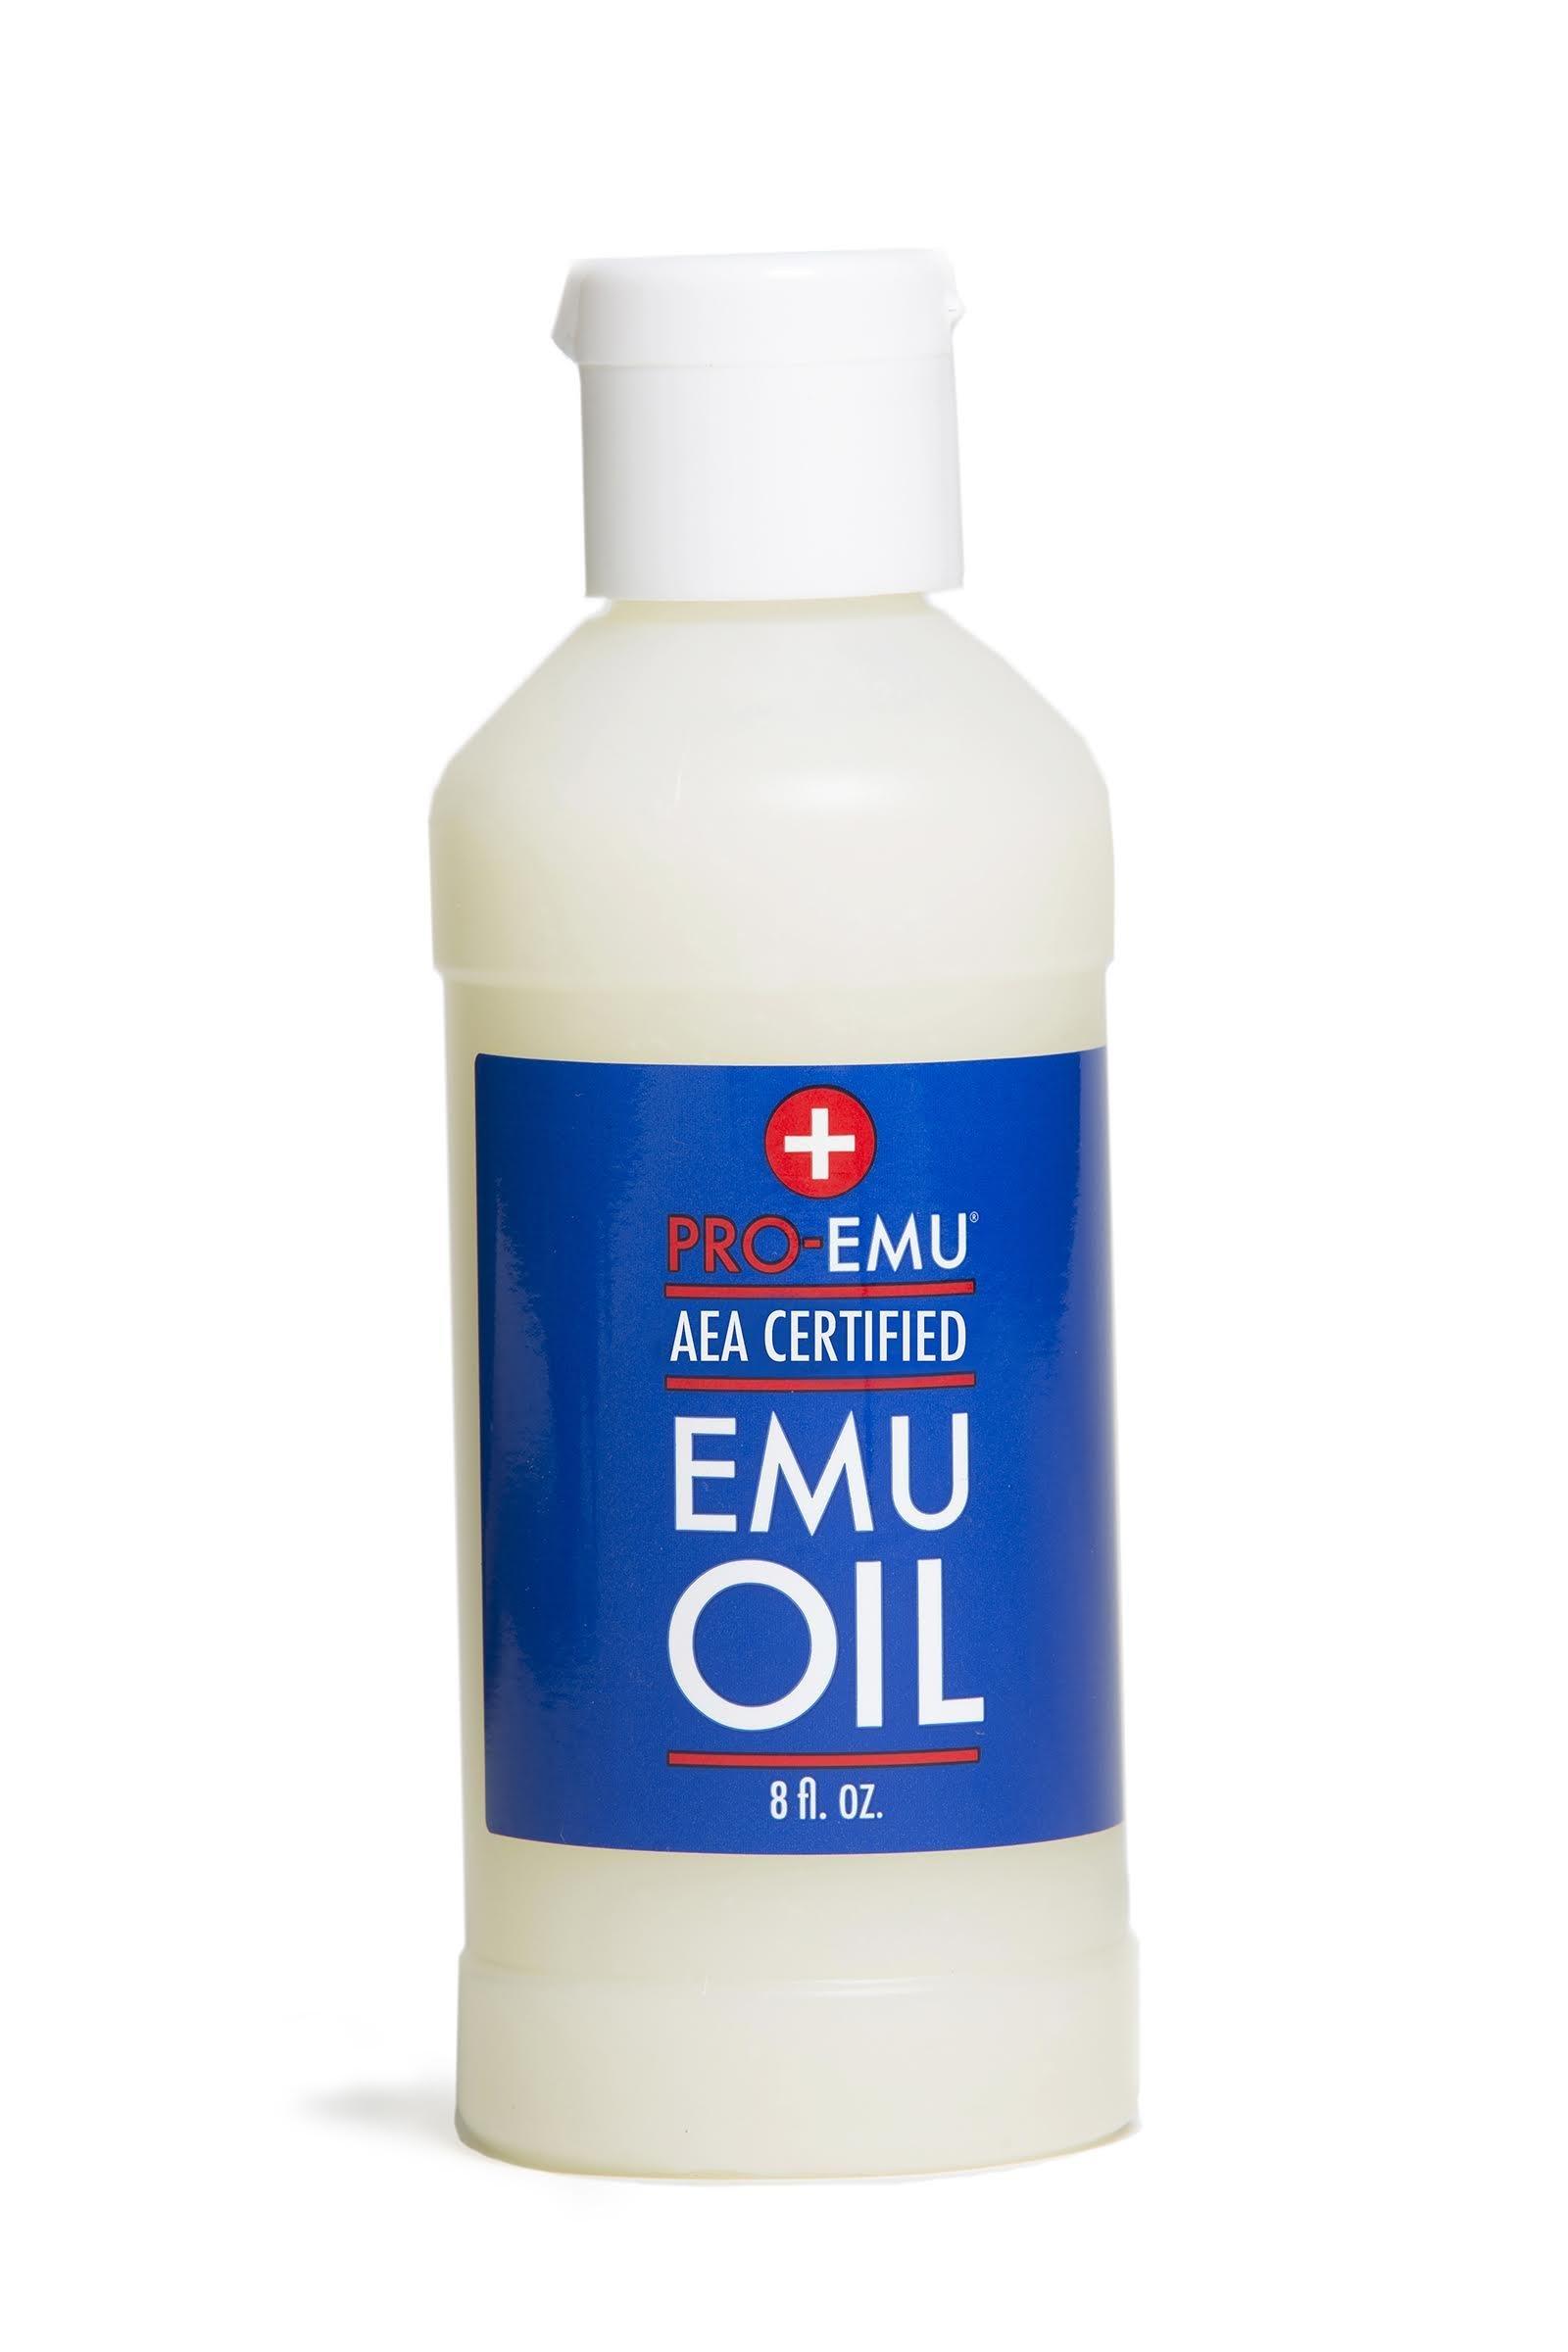 Amazon pro emu oil 16oz all natural emu oil aea pro emu oil 8 oz all natural emu oil aea certified made xflitez Image collections